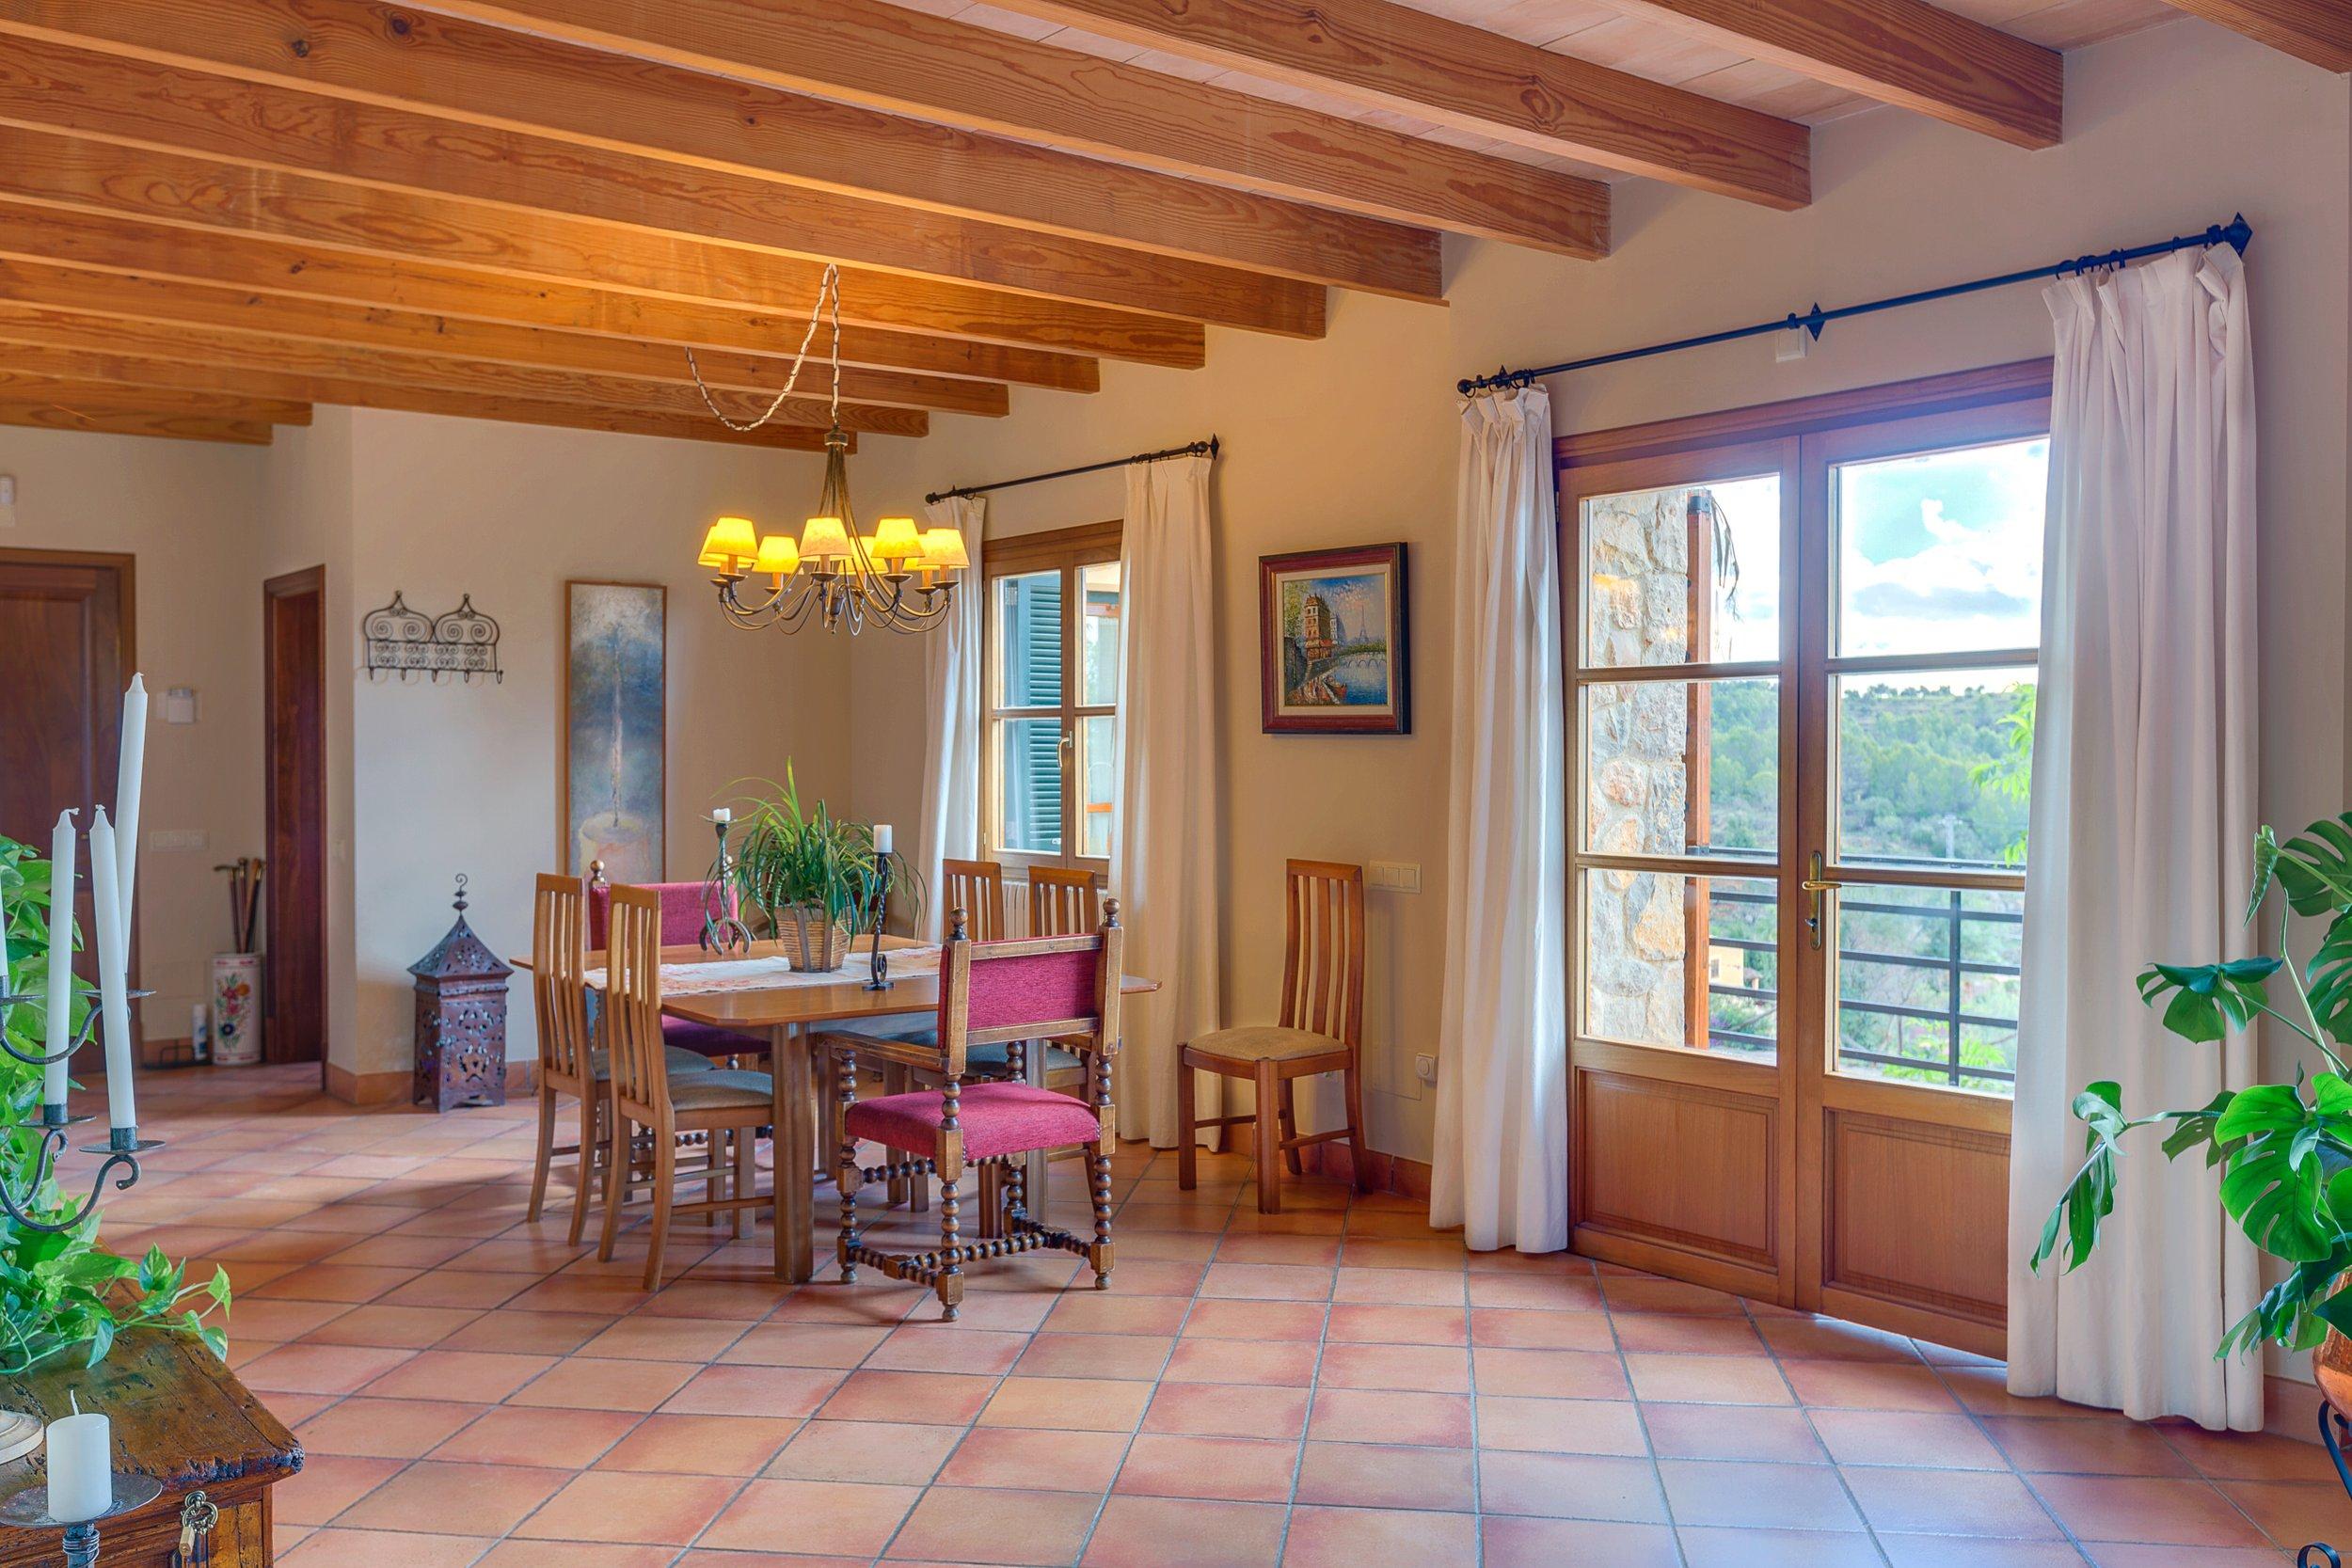 Maison de vacances Villa Cirera in Alaro (2611793), Alaro, Majorque, Iles Baléares, Espagne, image 14